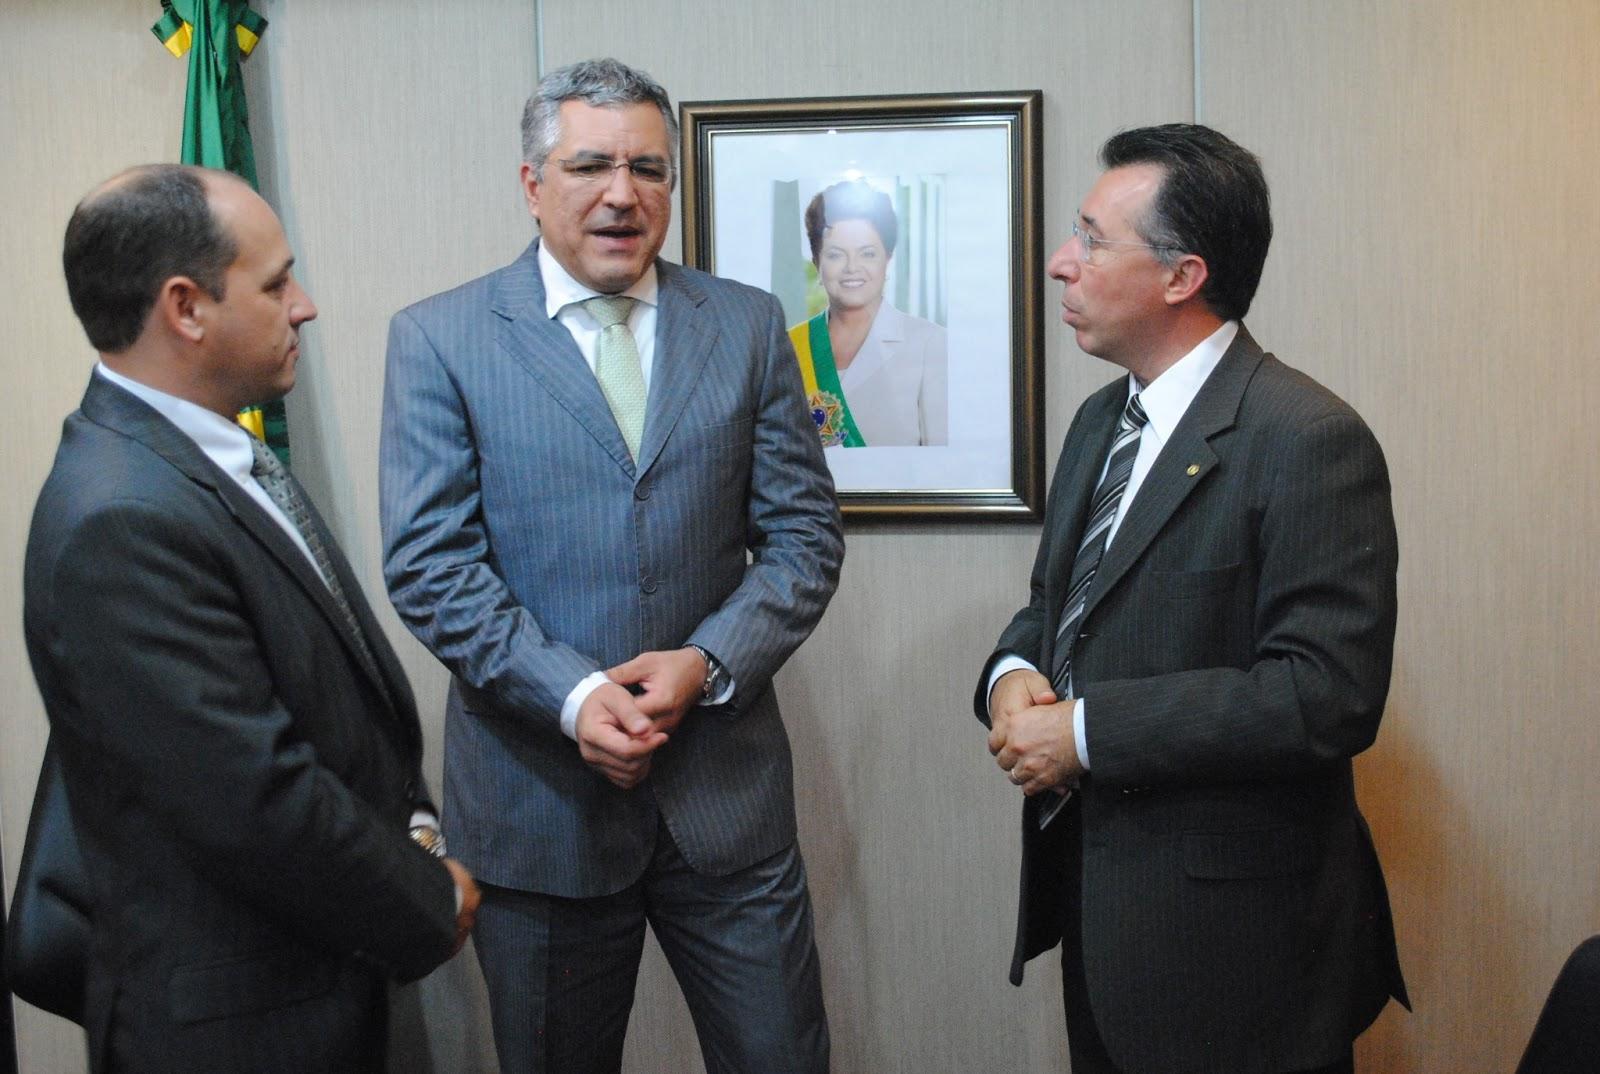 20130410_Ministro Padilha em Brasília